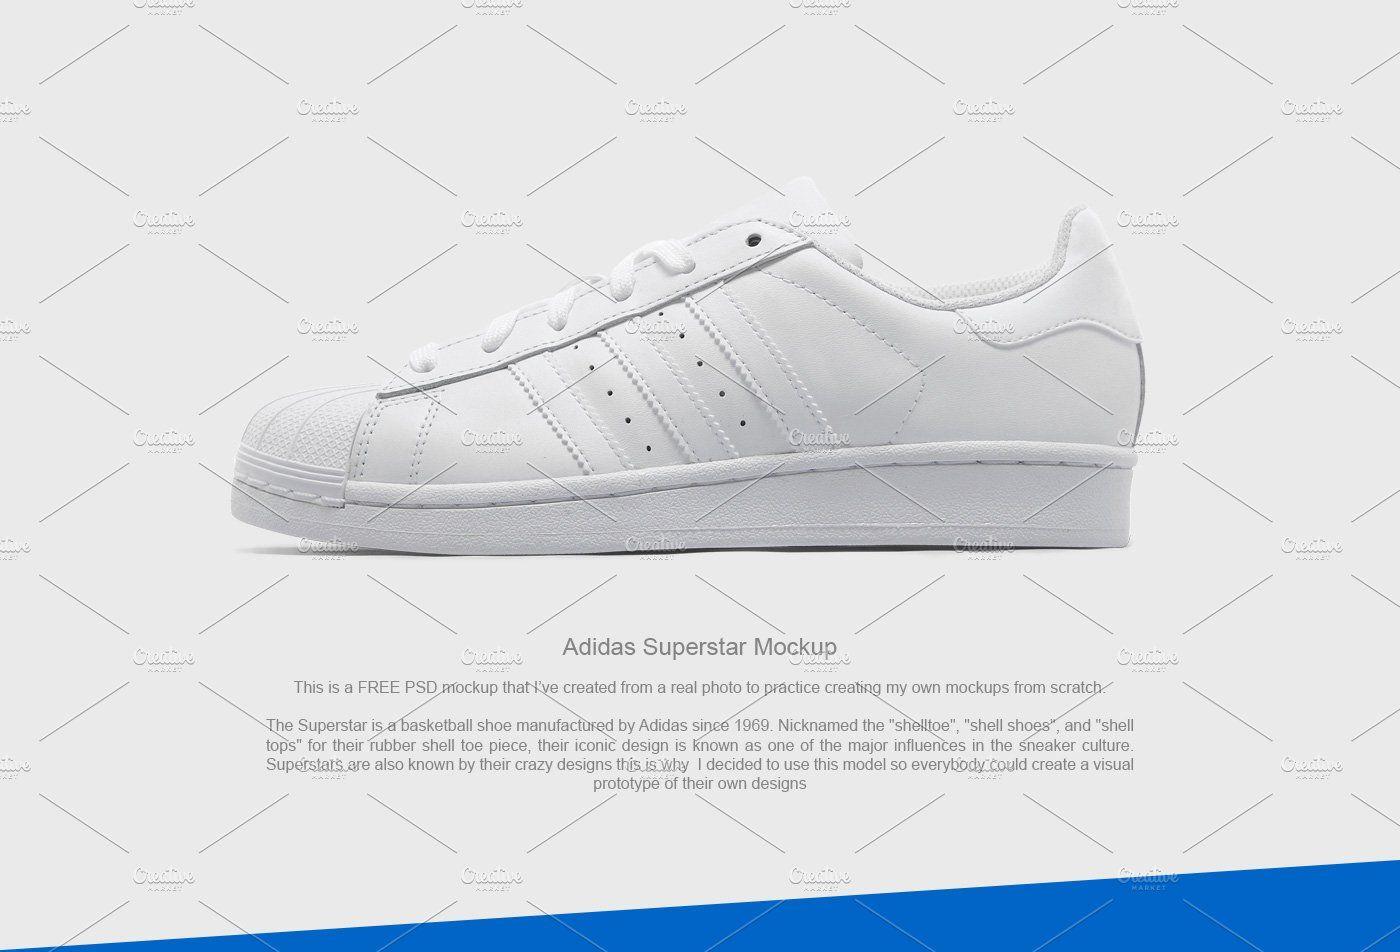 adidas scratch superstar